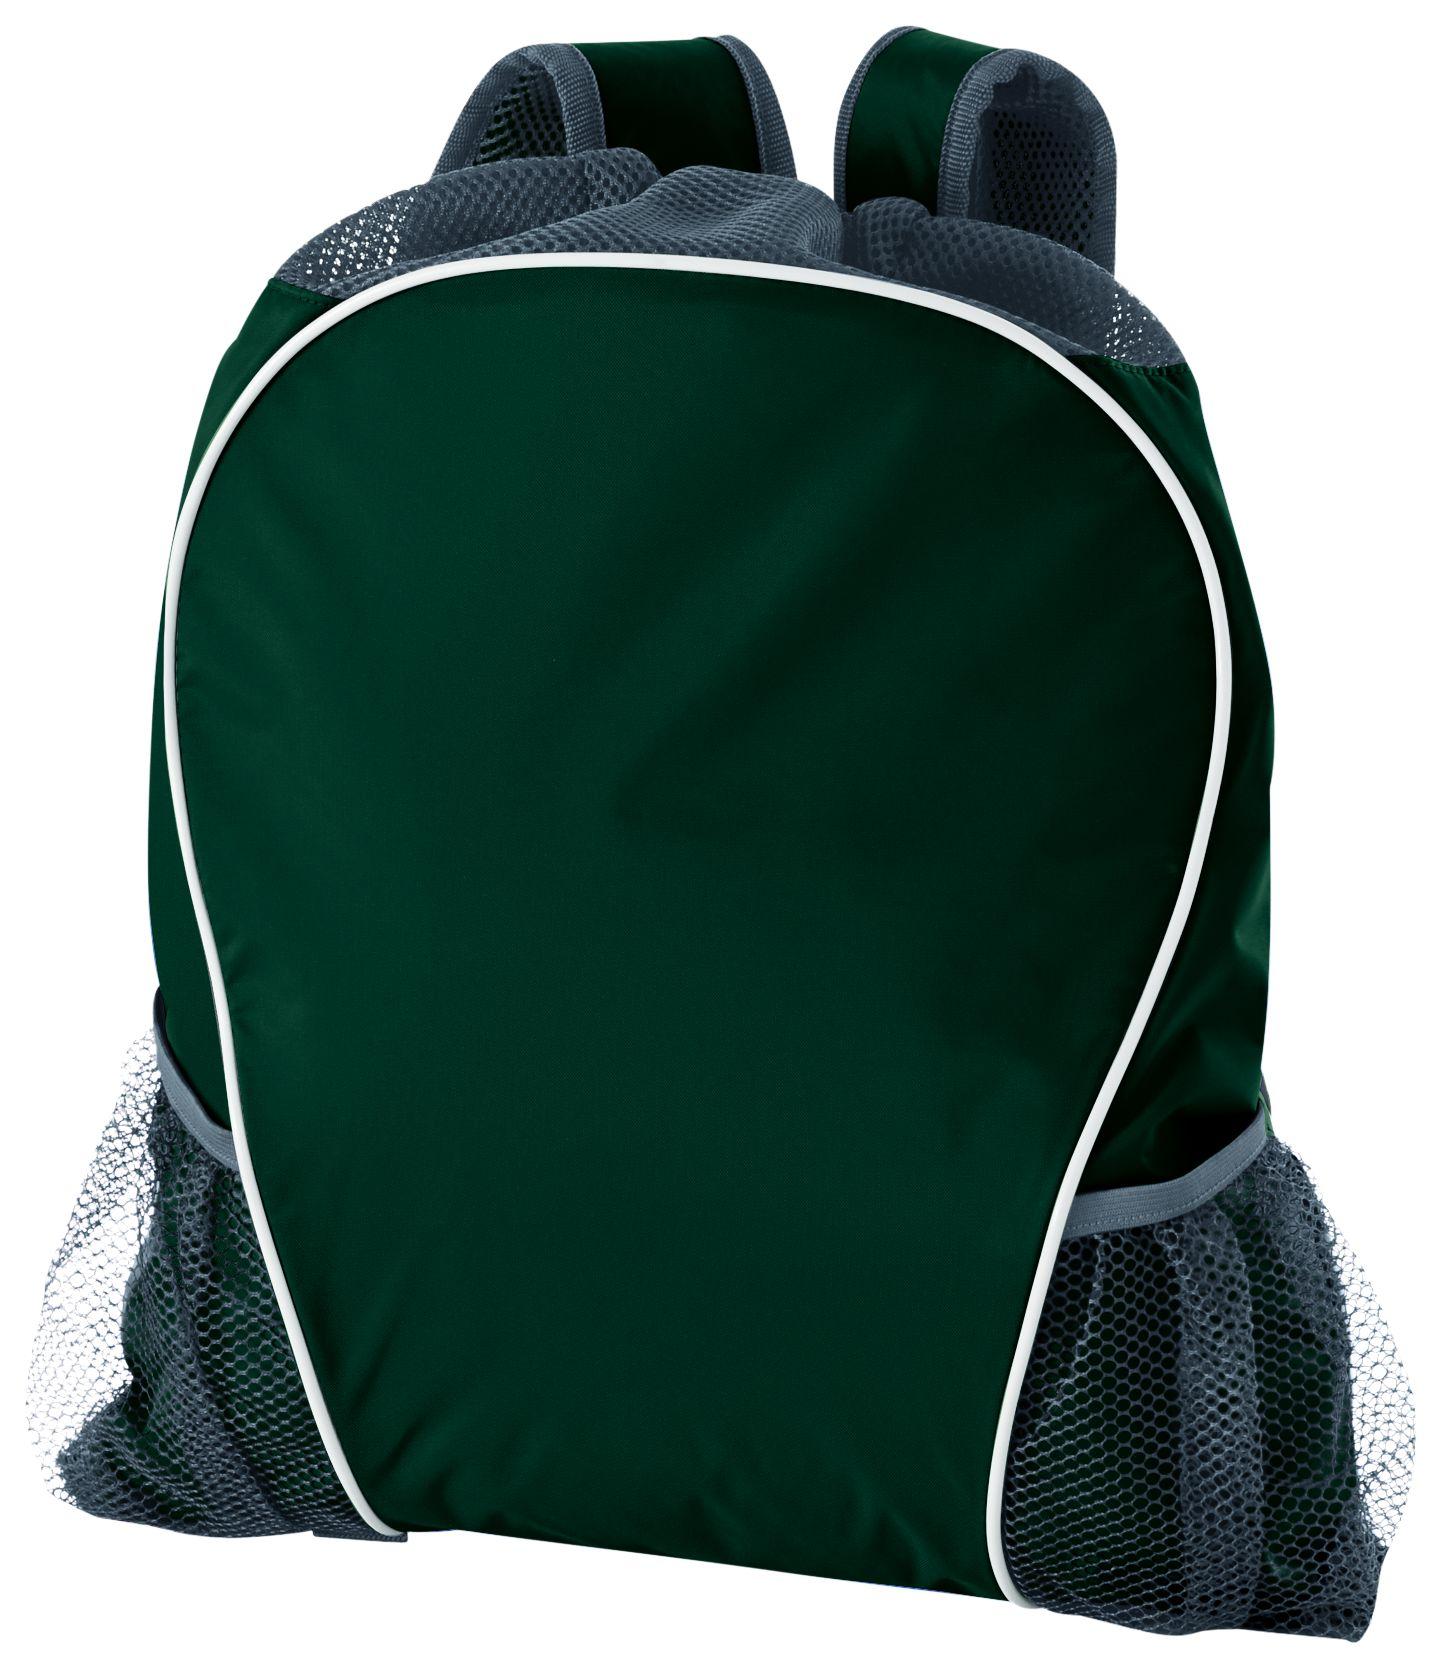 Rig Bag - DARK GREEN/GRAPHITE/WHITE